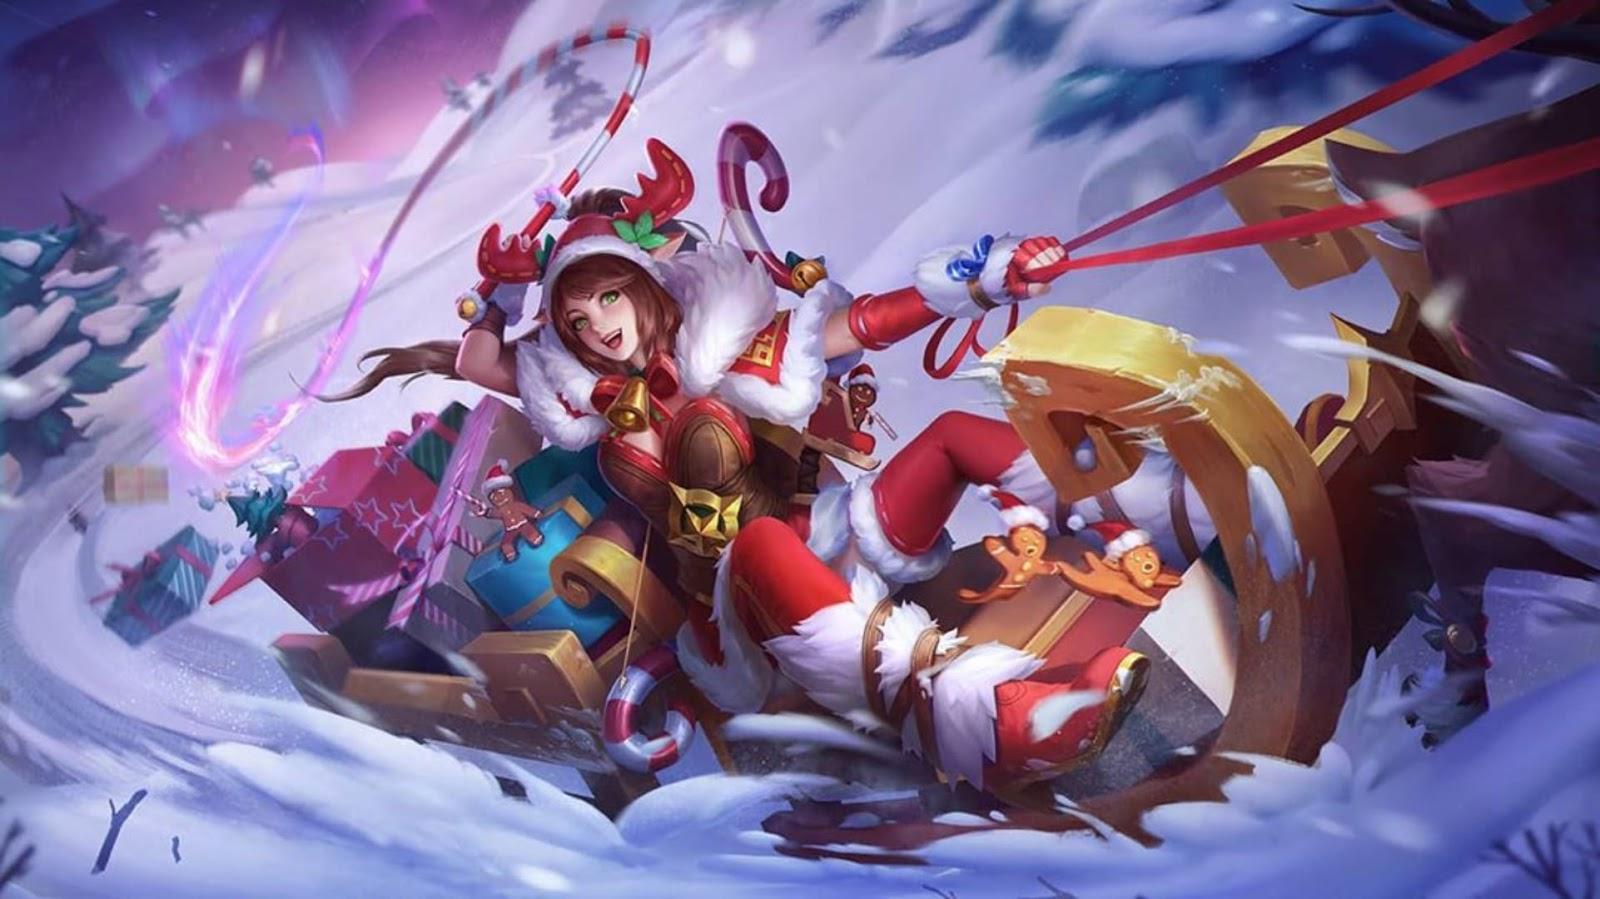 Wallpaper Miya Christmas Carnival Skin Mobile Legends HD for PC